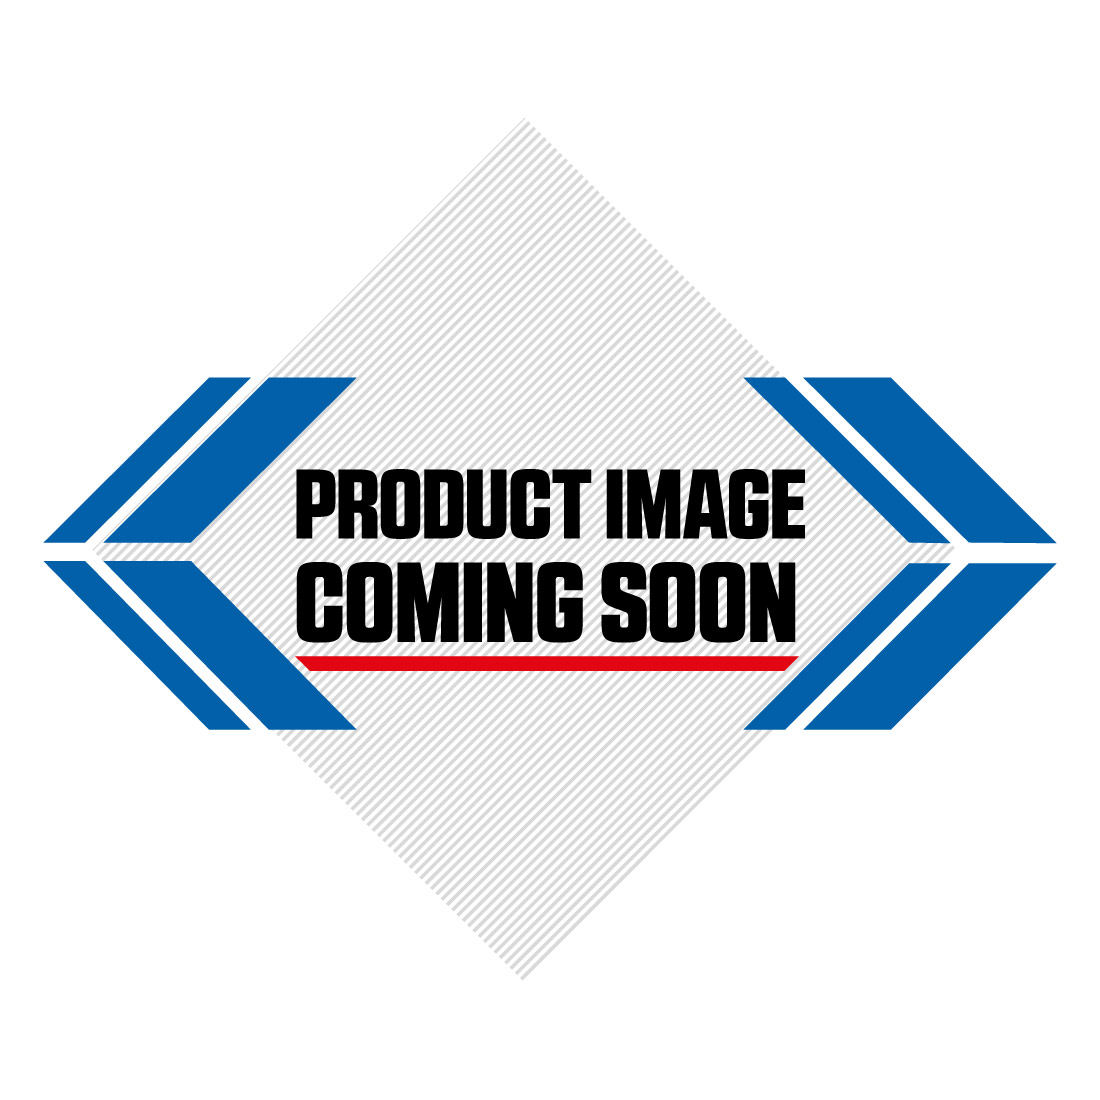 Honda Plastic Kit CRF 230 (15-20) OEM Factory Image-3>